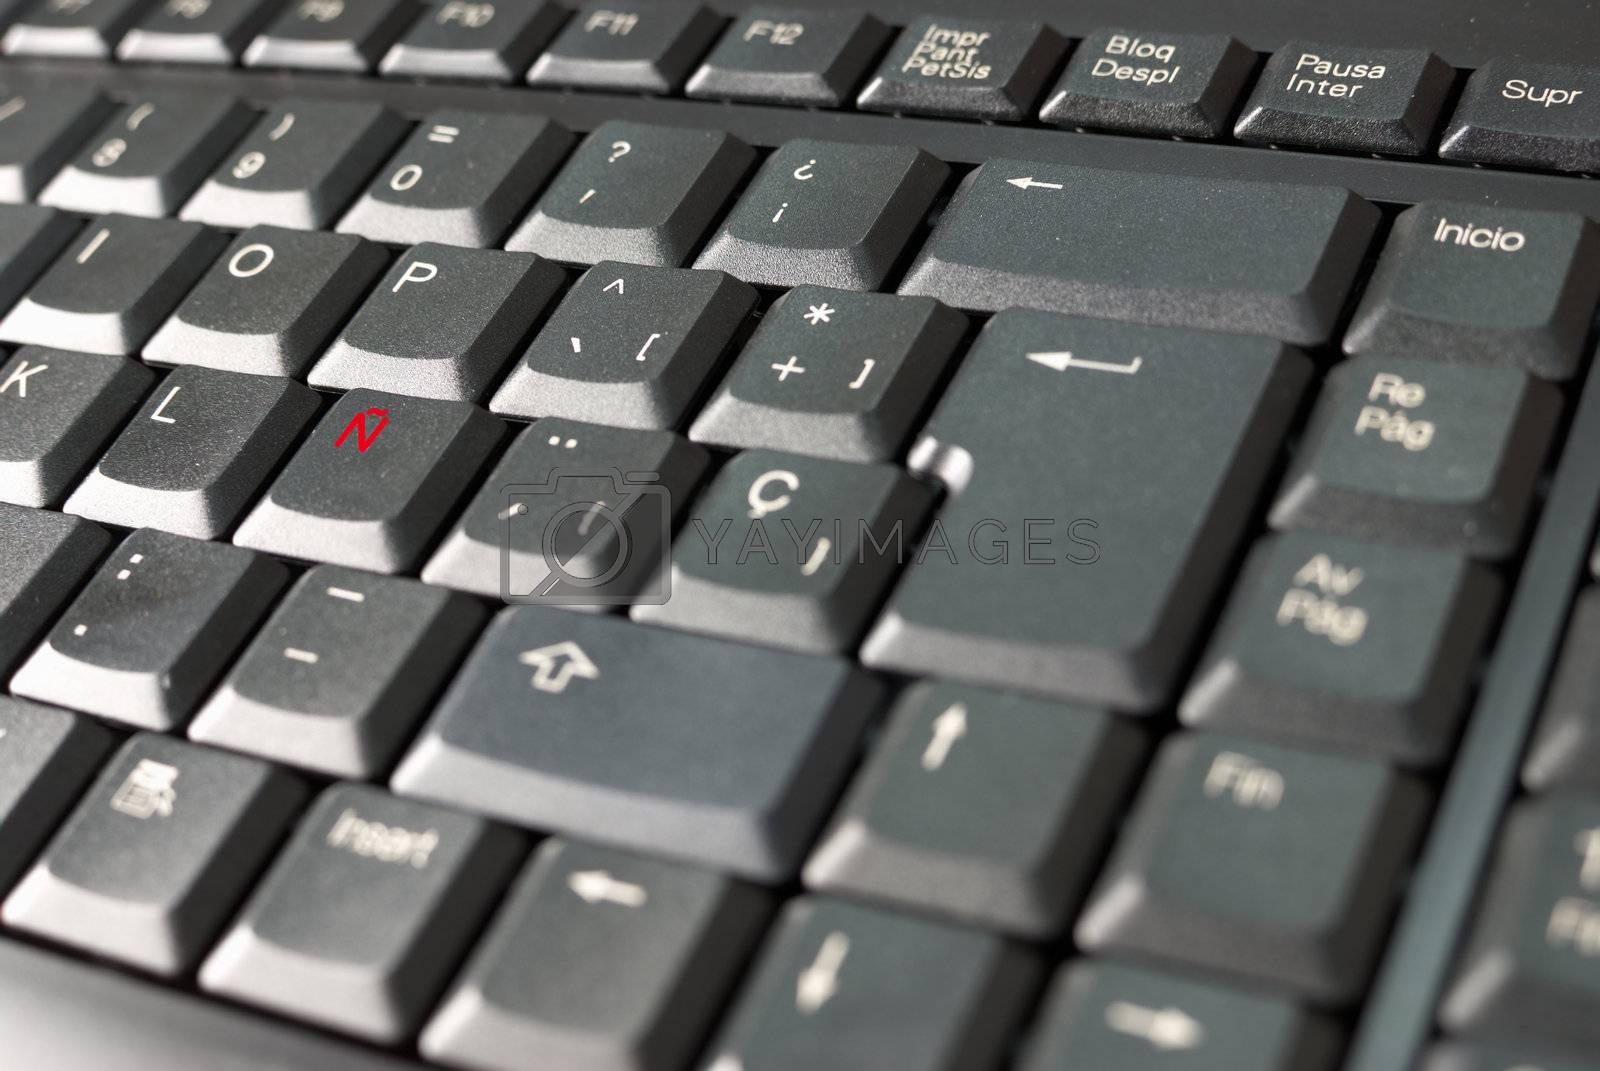 Royalty free image of Spanish keyboard by hemeroskopion